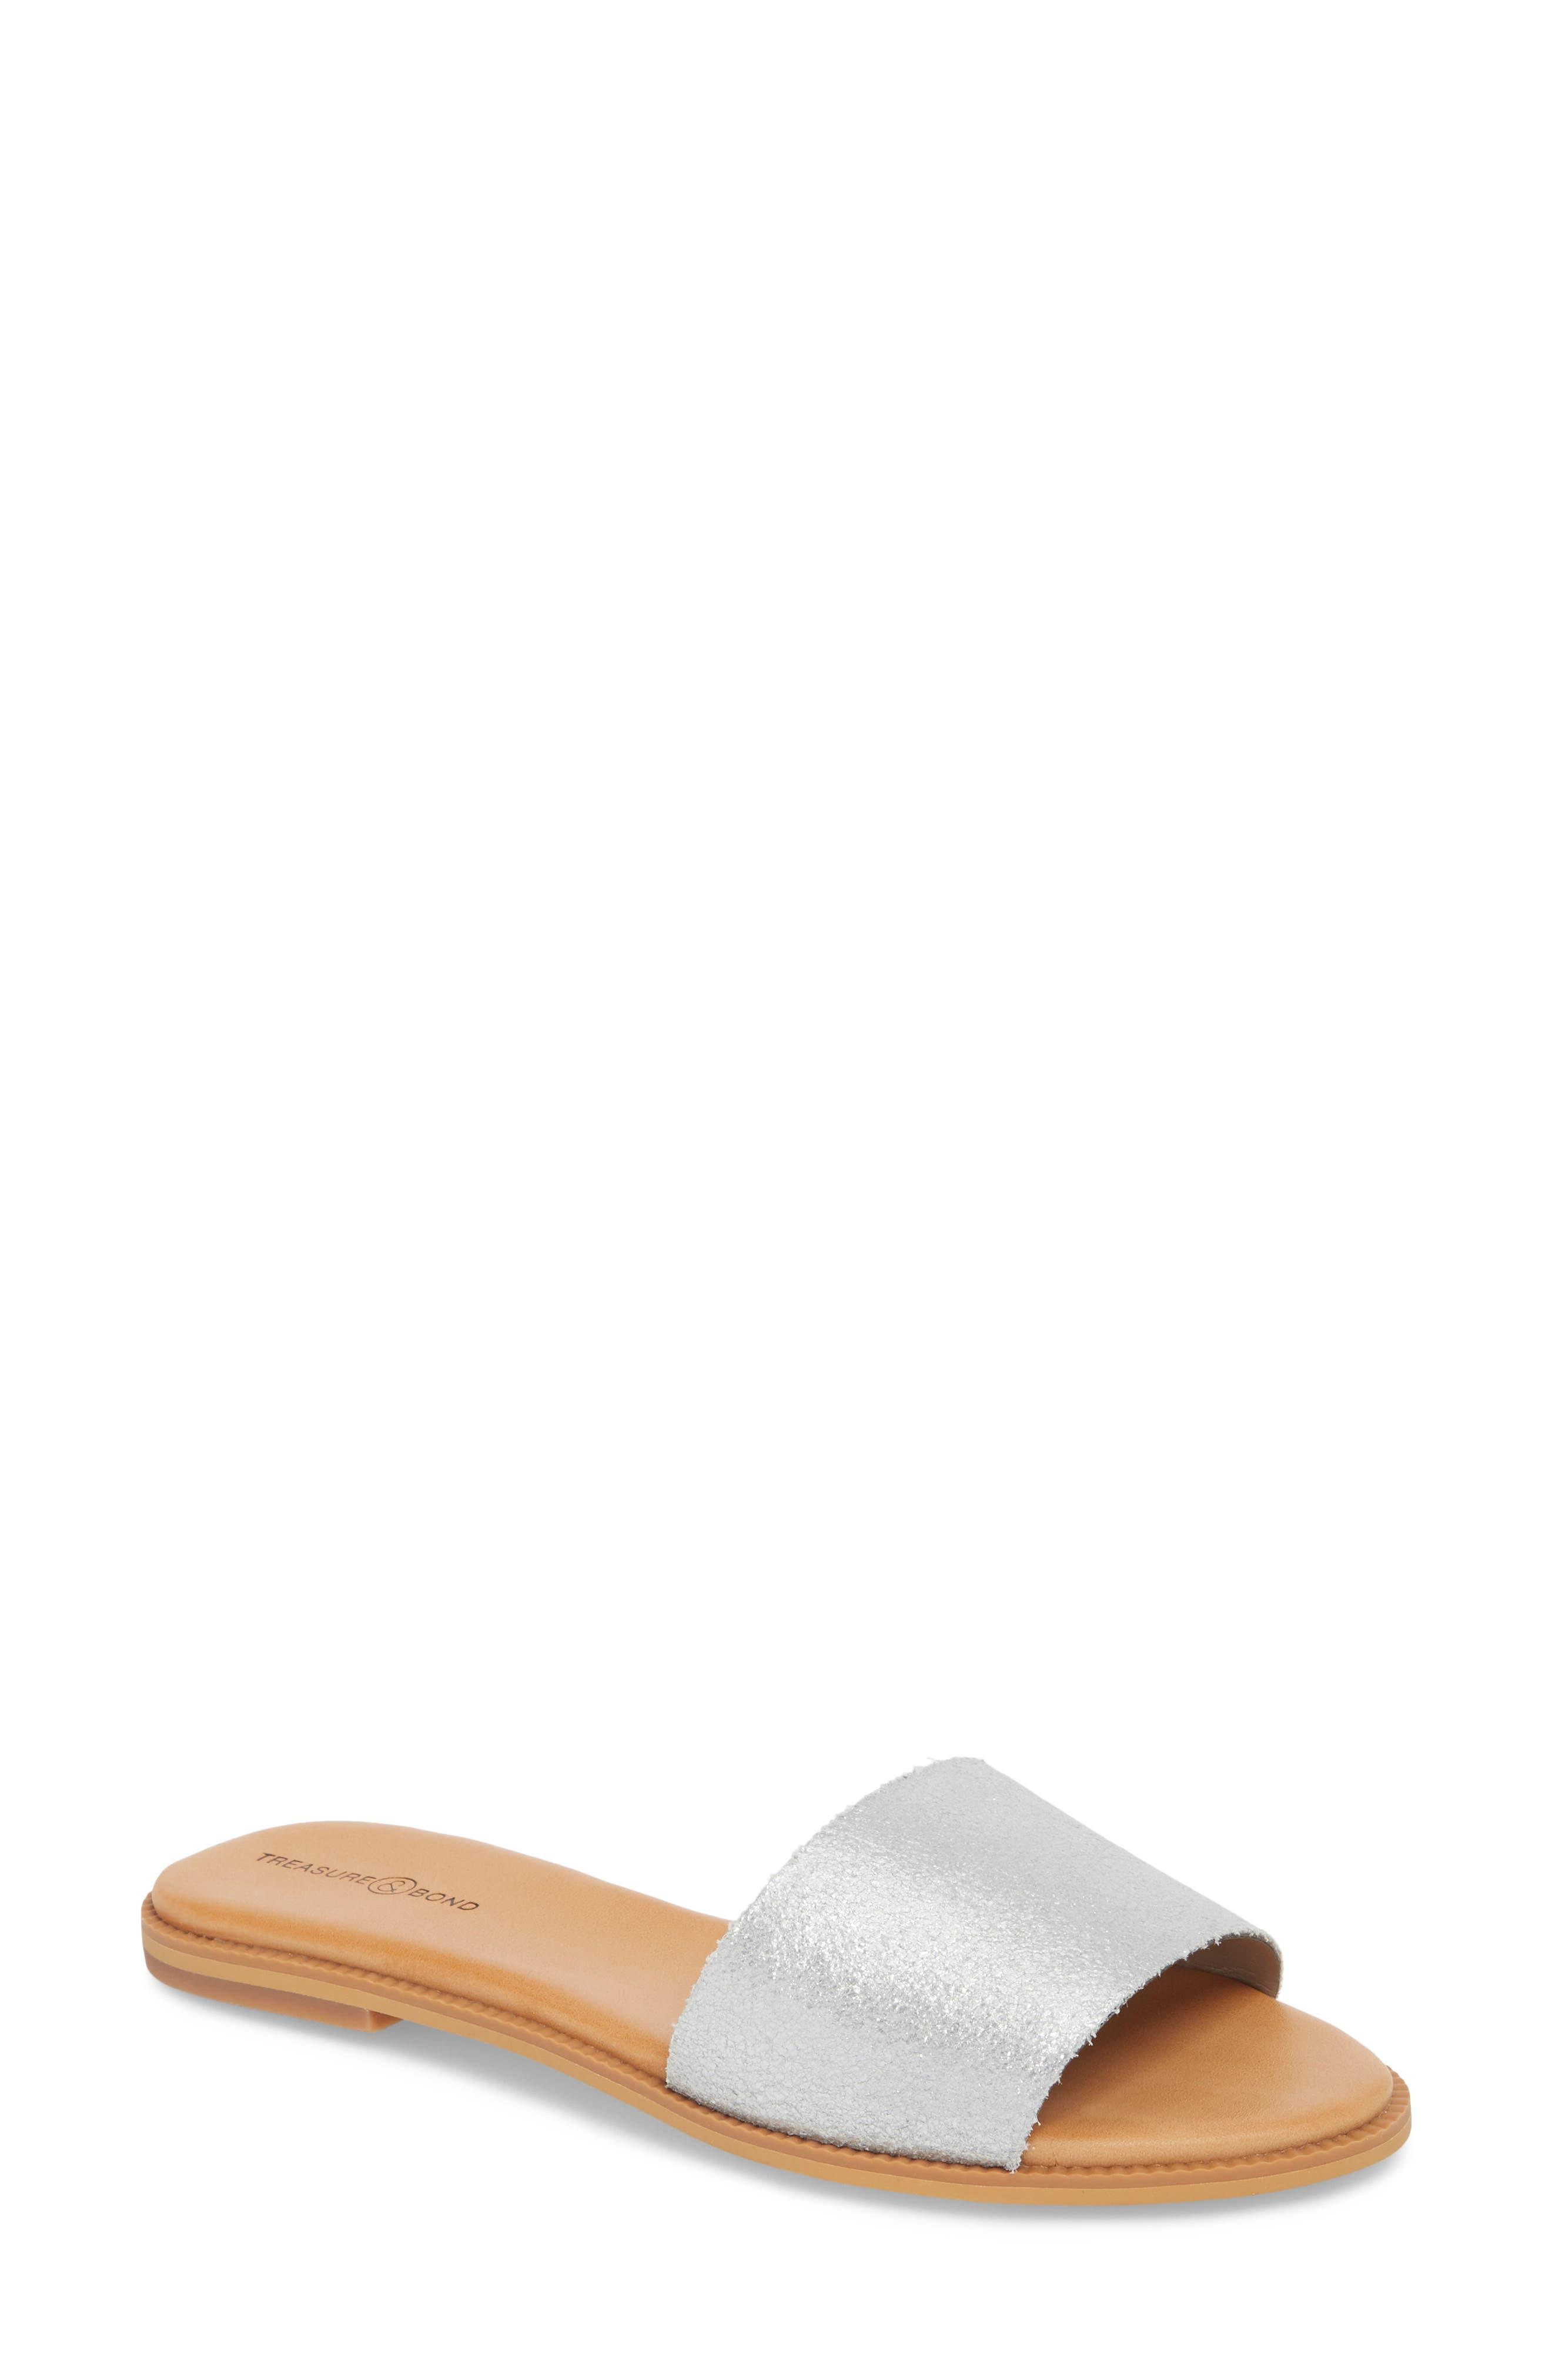 Main Image - Treasure & Bond Mere Flat Slide Sandal (Women)